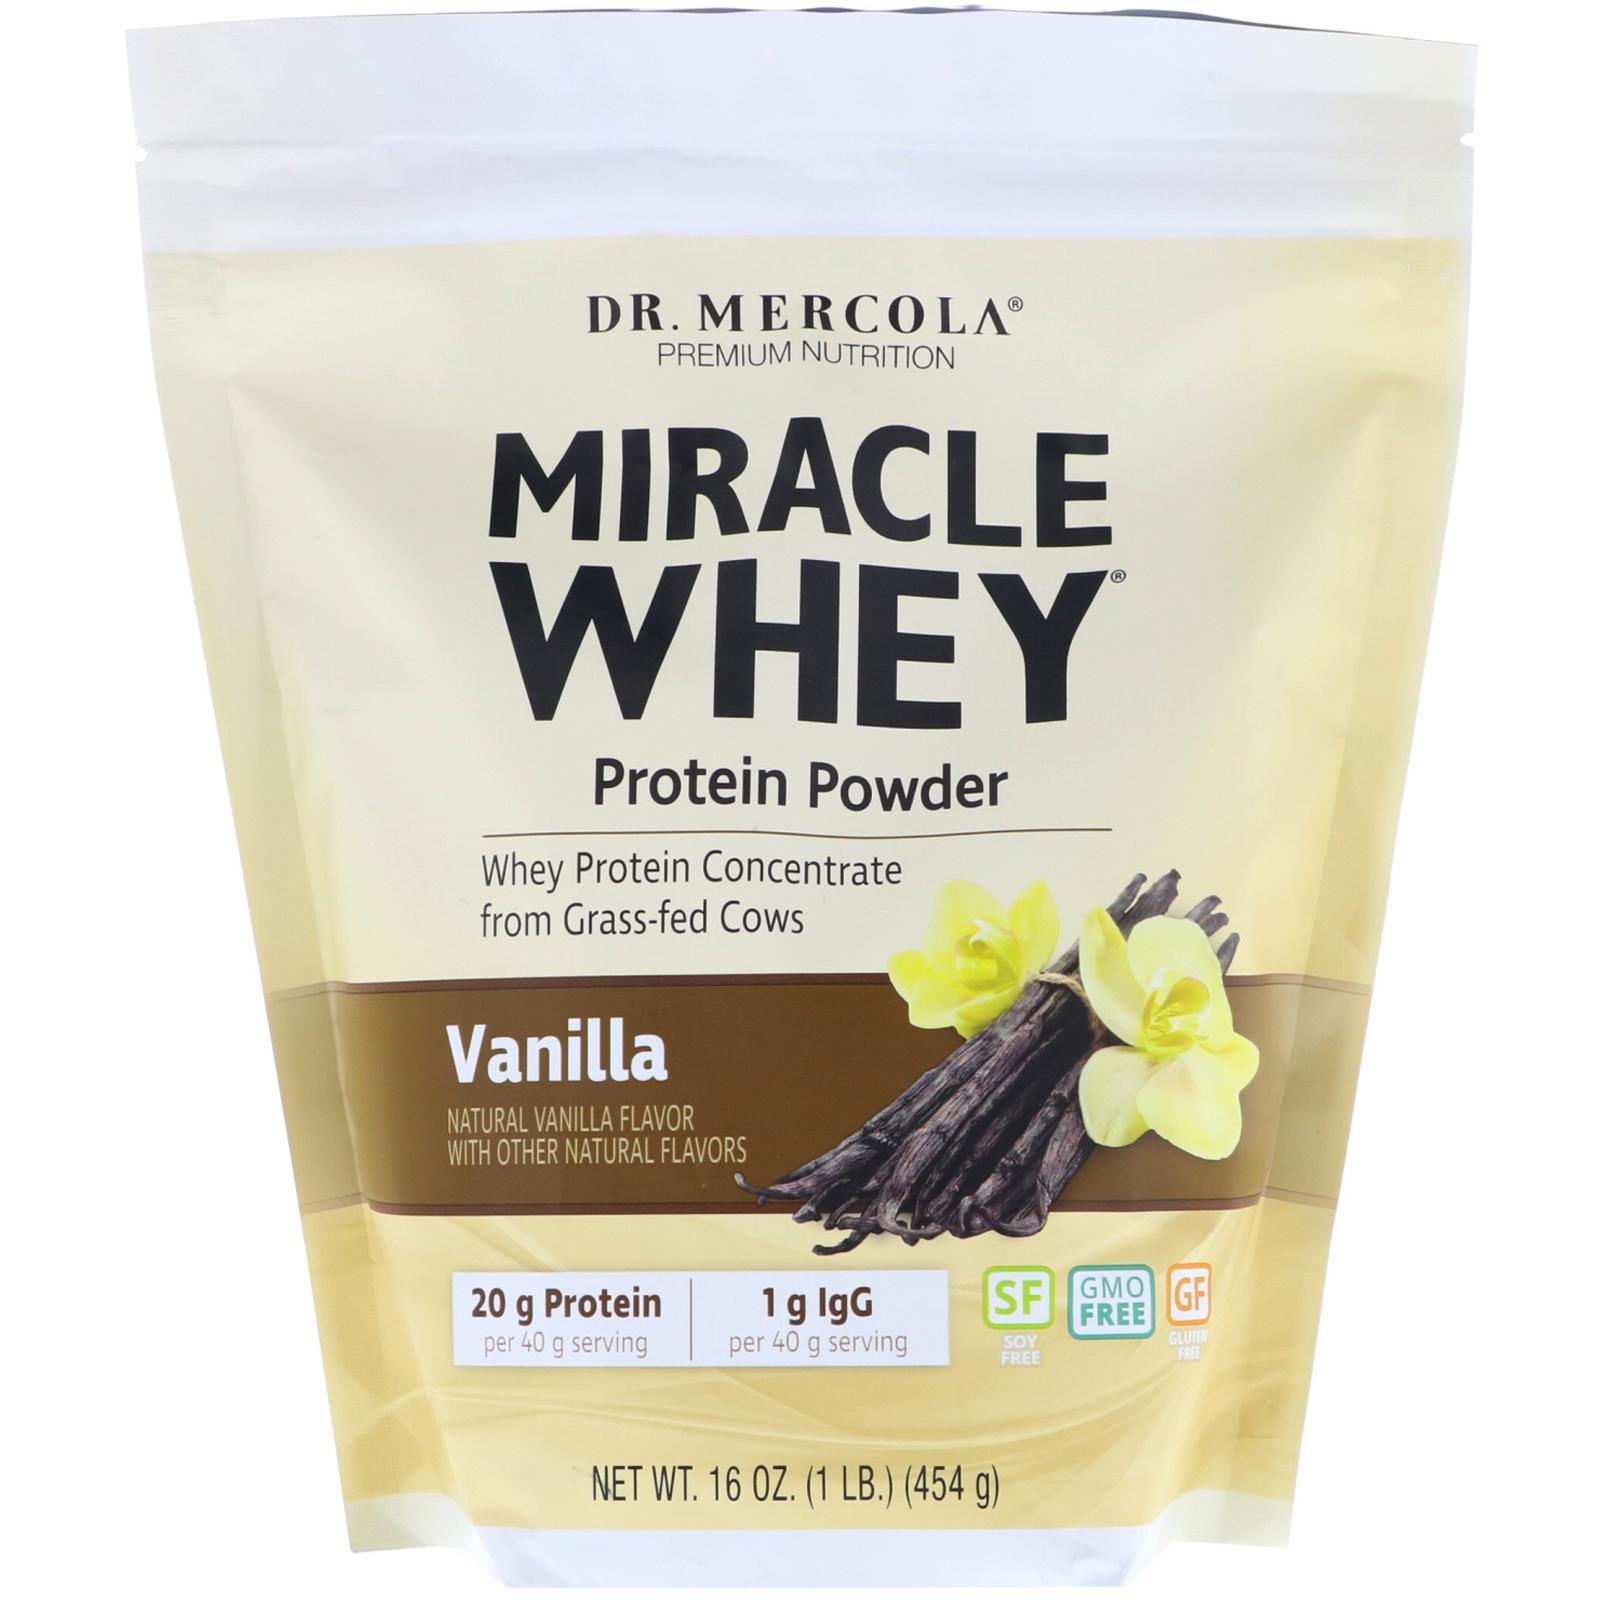 Image of Dr. Mercola, Miracle Whey, Protein Powder, Vanilla, 1 lb (454 g) 0813006011358